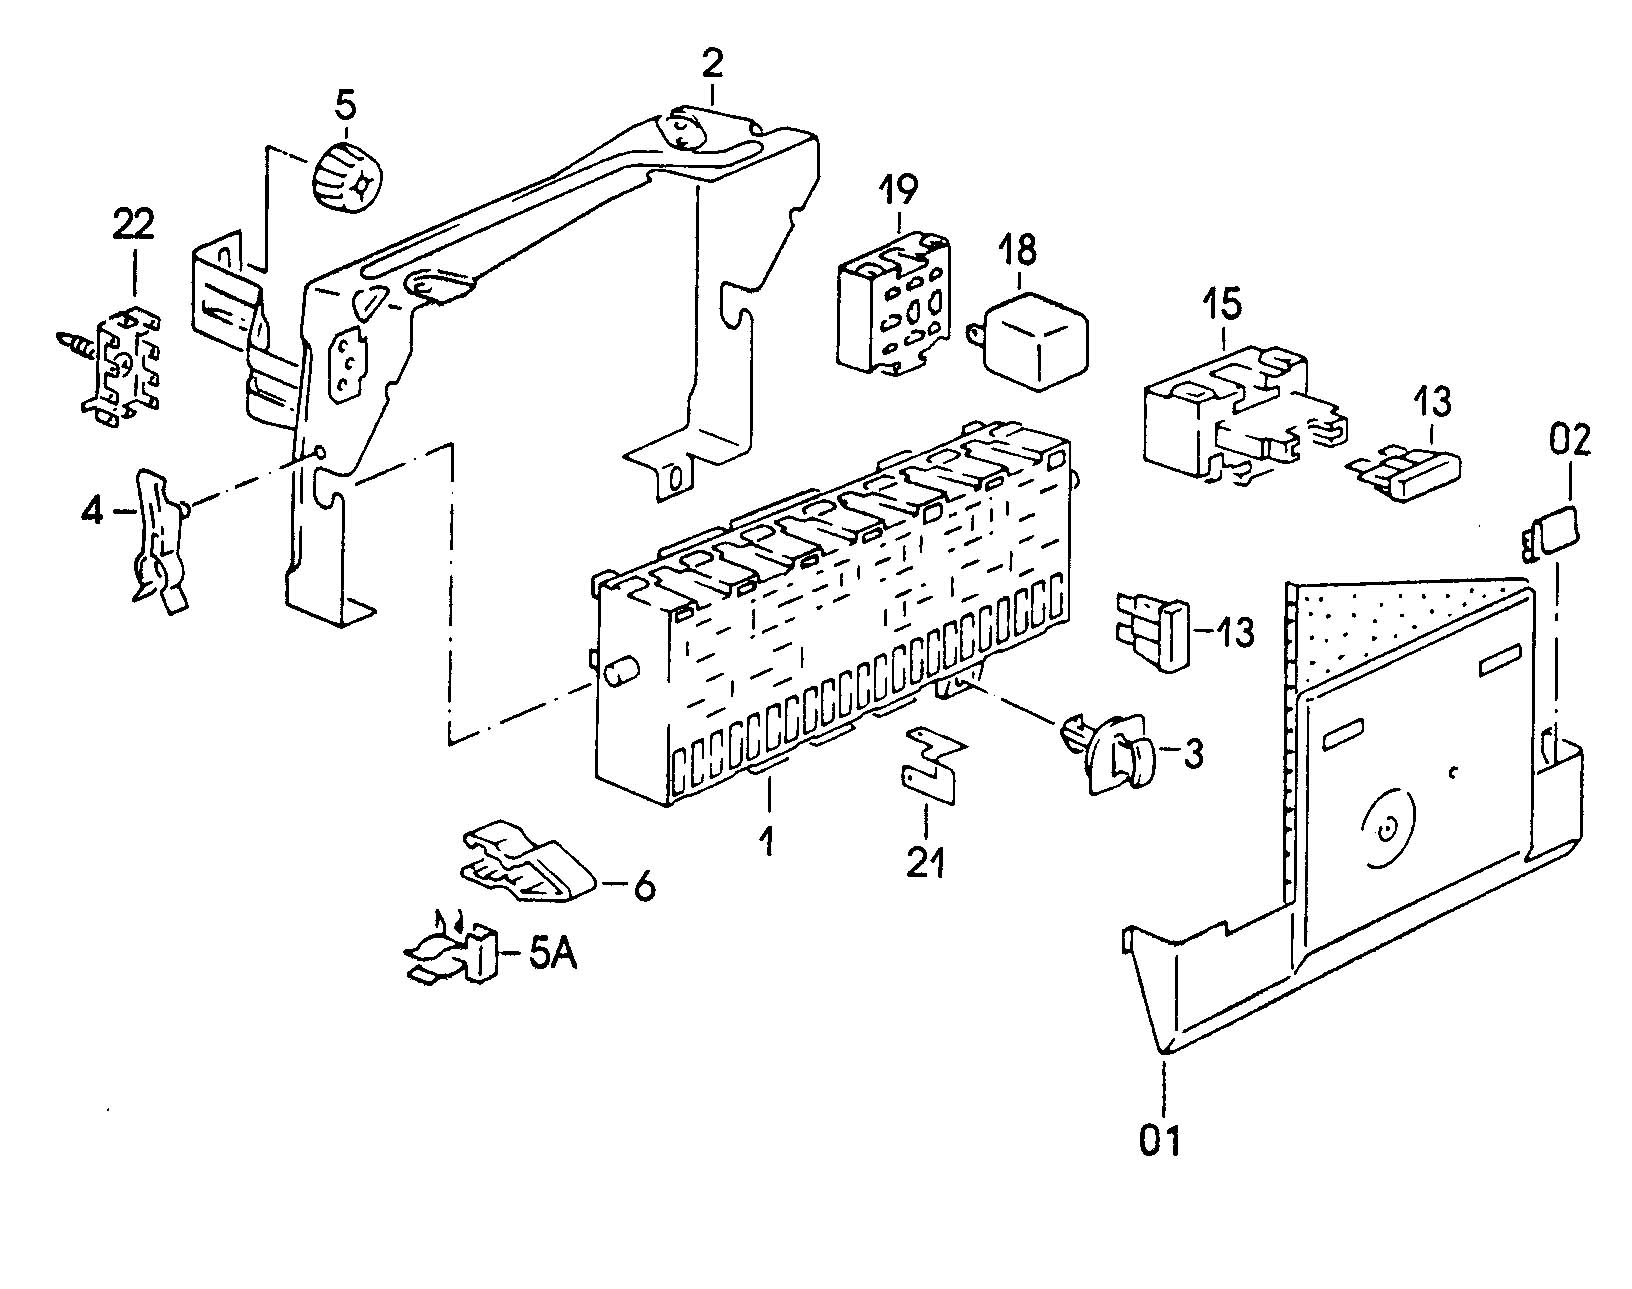 1982 vw rabbit pickup fuse box diagram